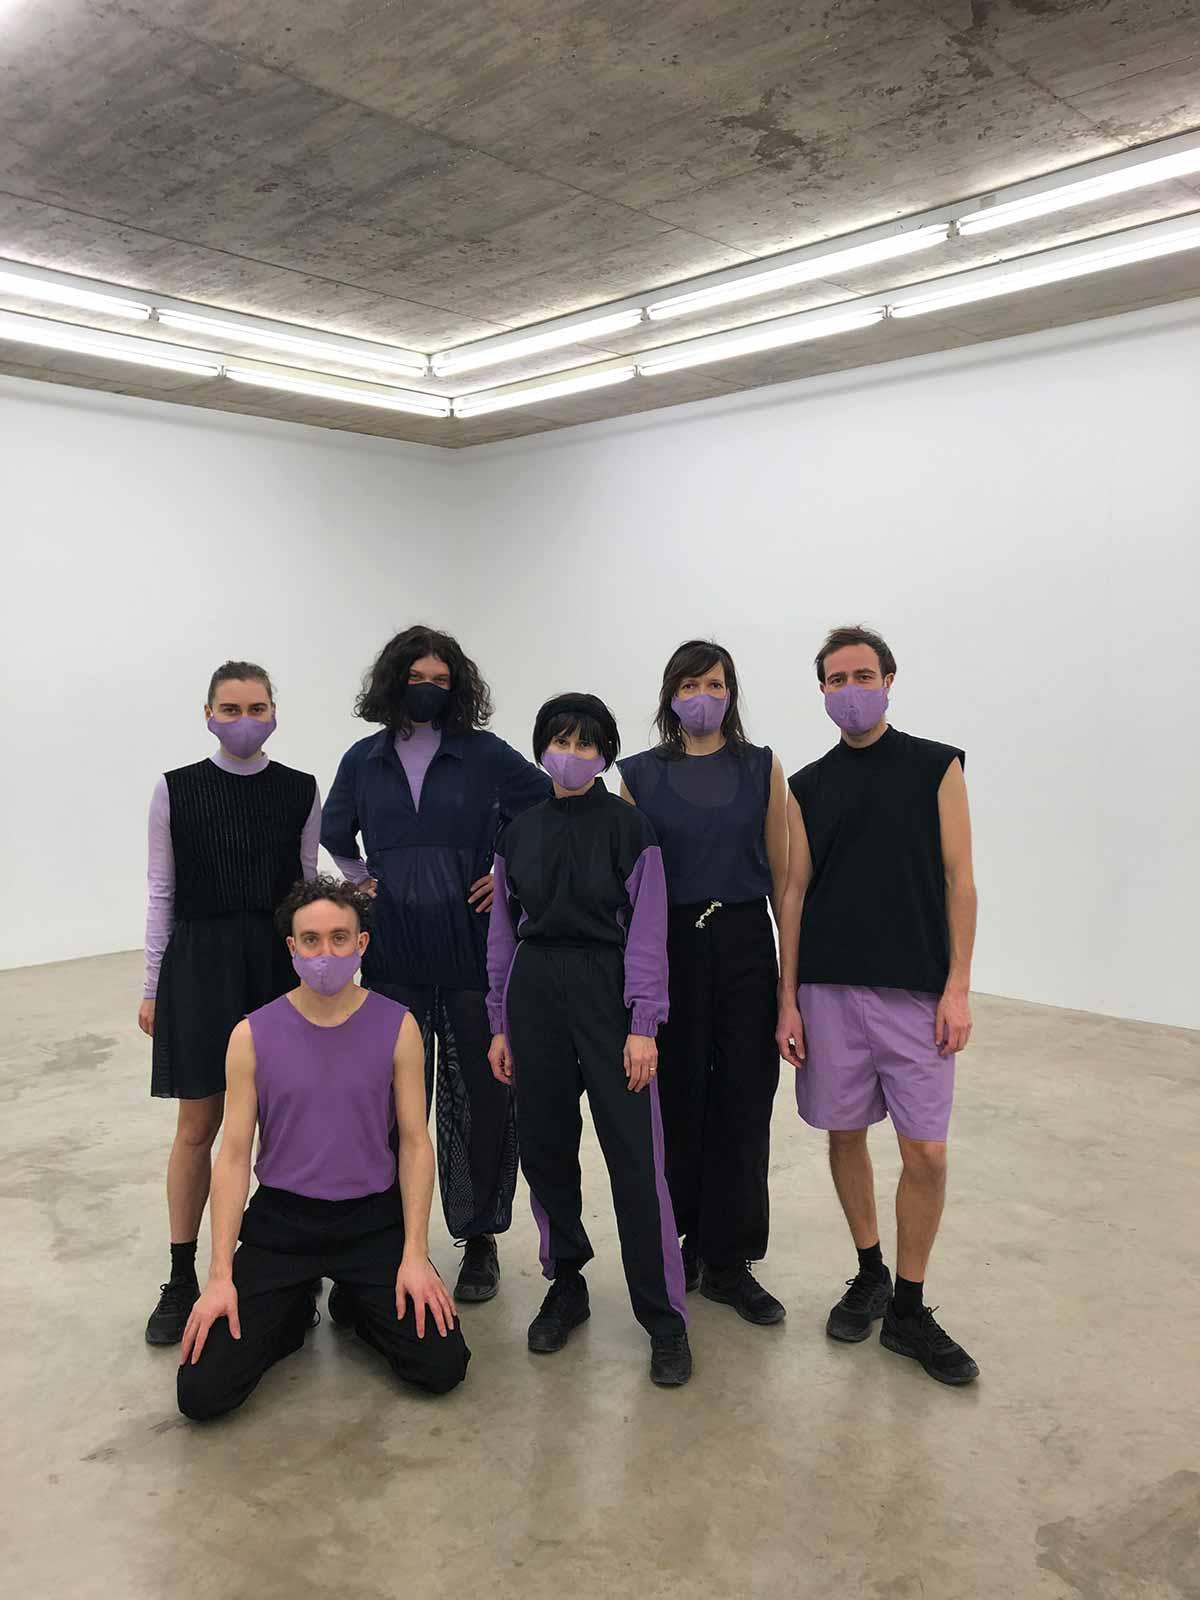 daniela geborgieva, art movement, ballet, show, project, 2021